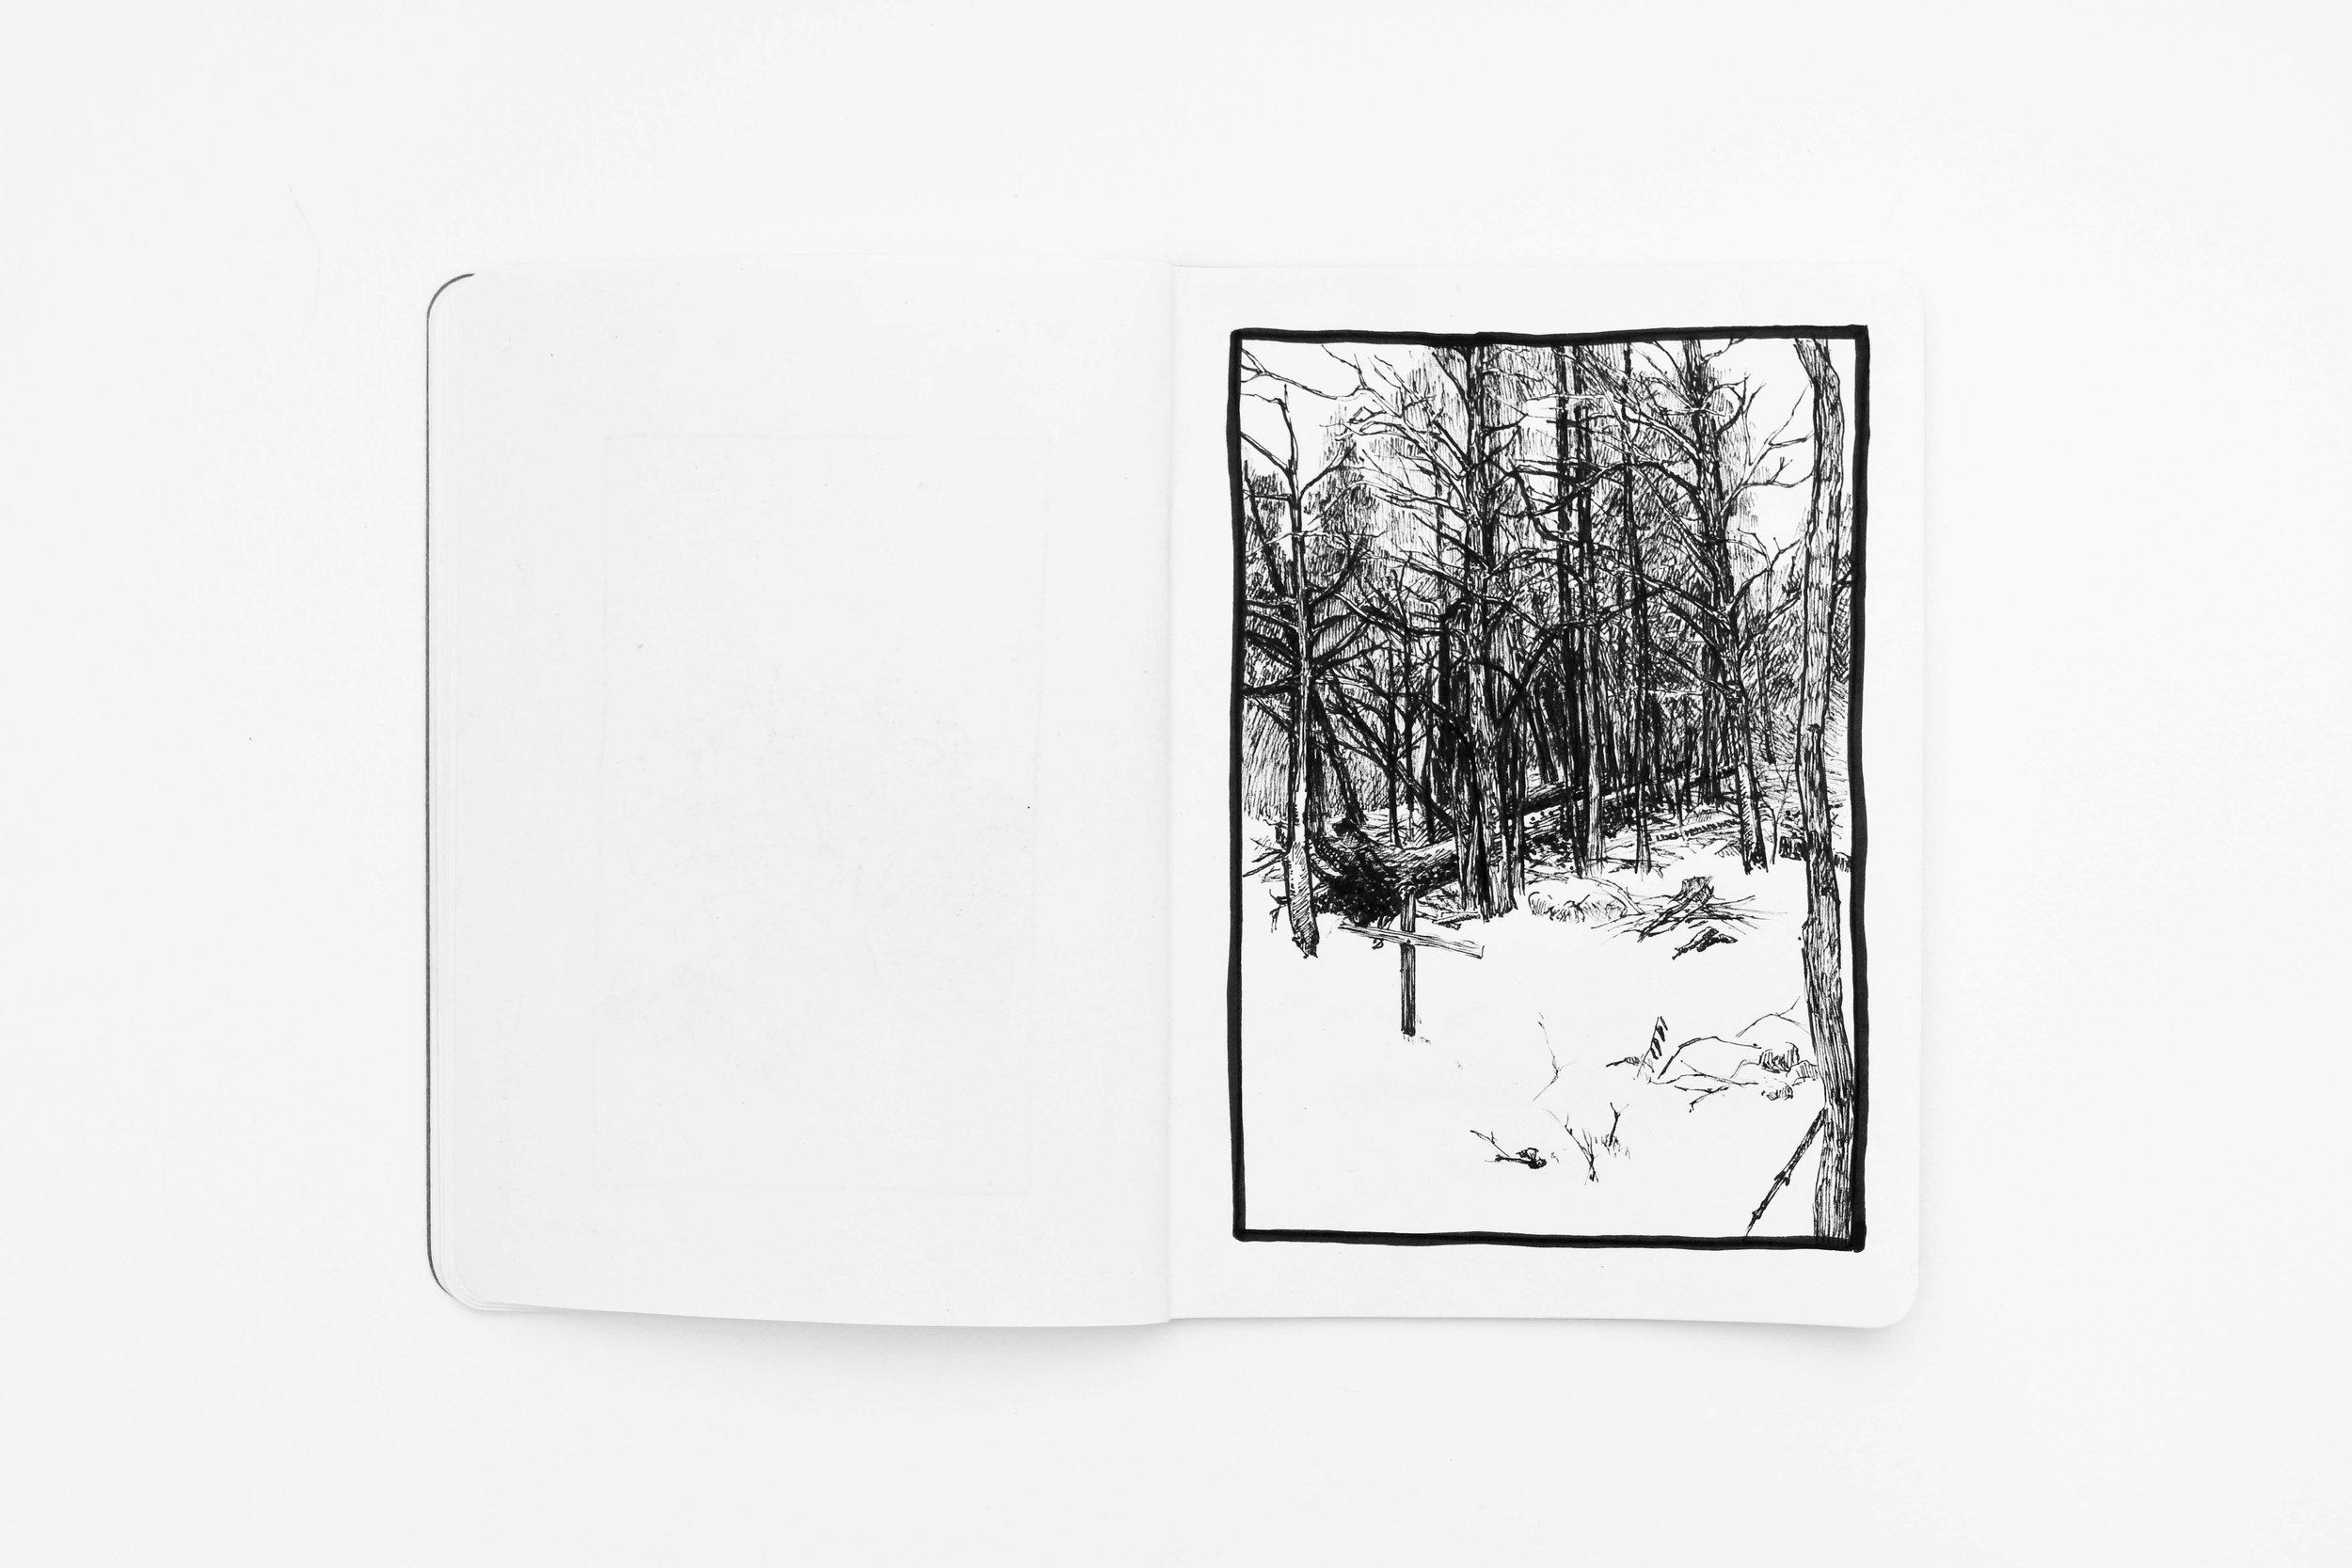 tiffany-moore-sketchbook-landscape (11 of 13)-3.jpg